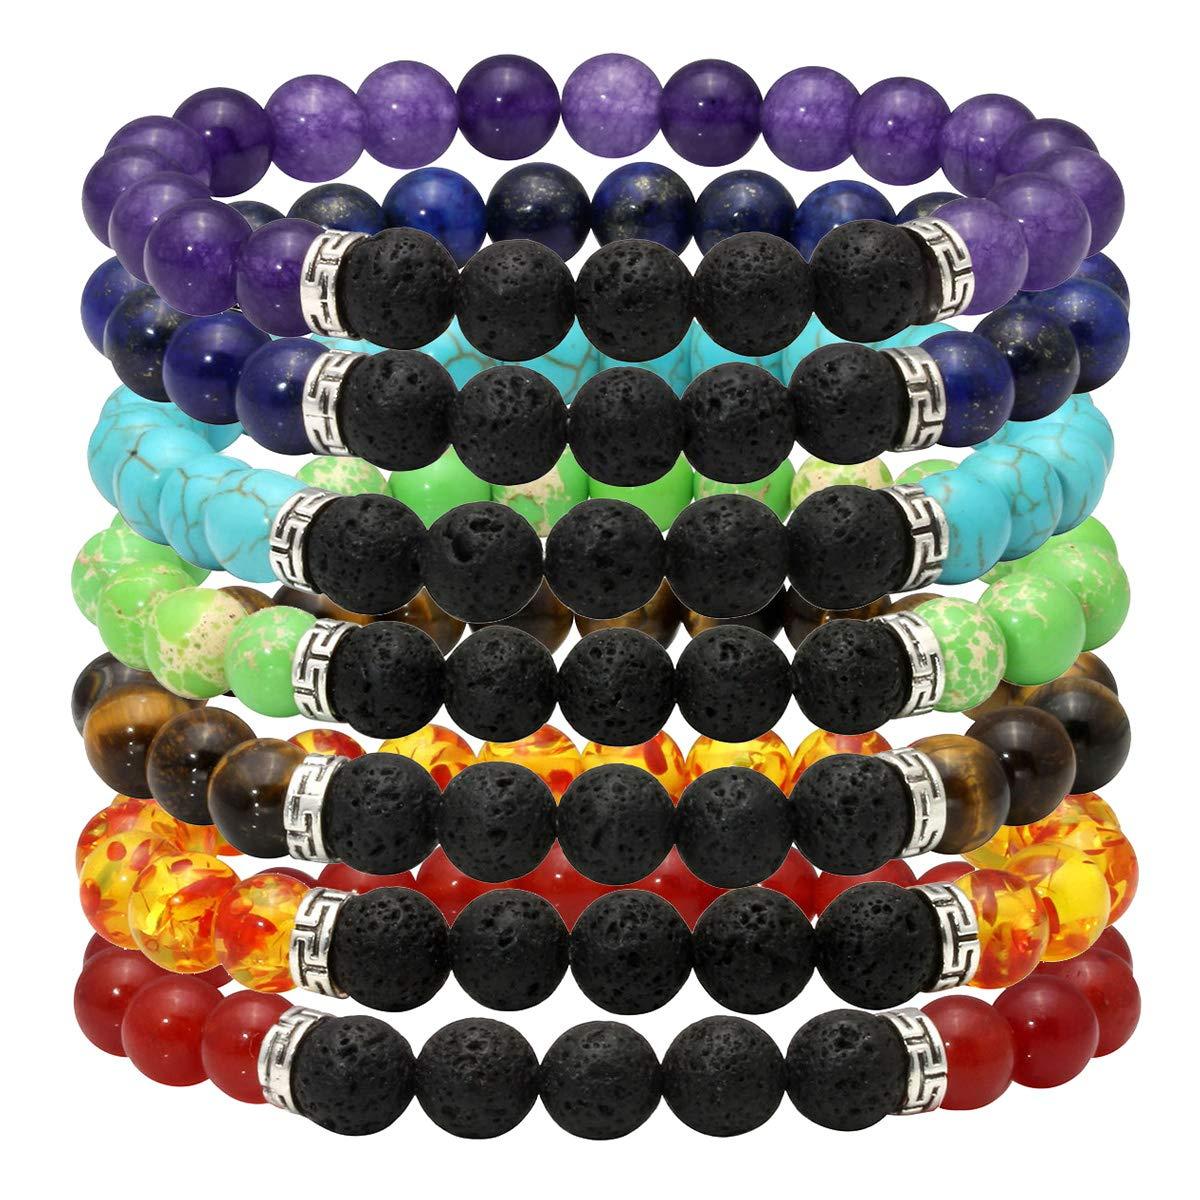 Eigso 7 Chakras Bead Bracelet Mens Womens Aromatherapy Diffuser Bracelet Set Mala Bracelet Elastic